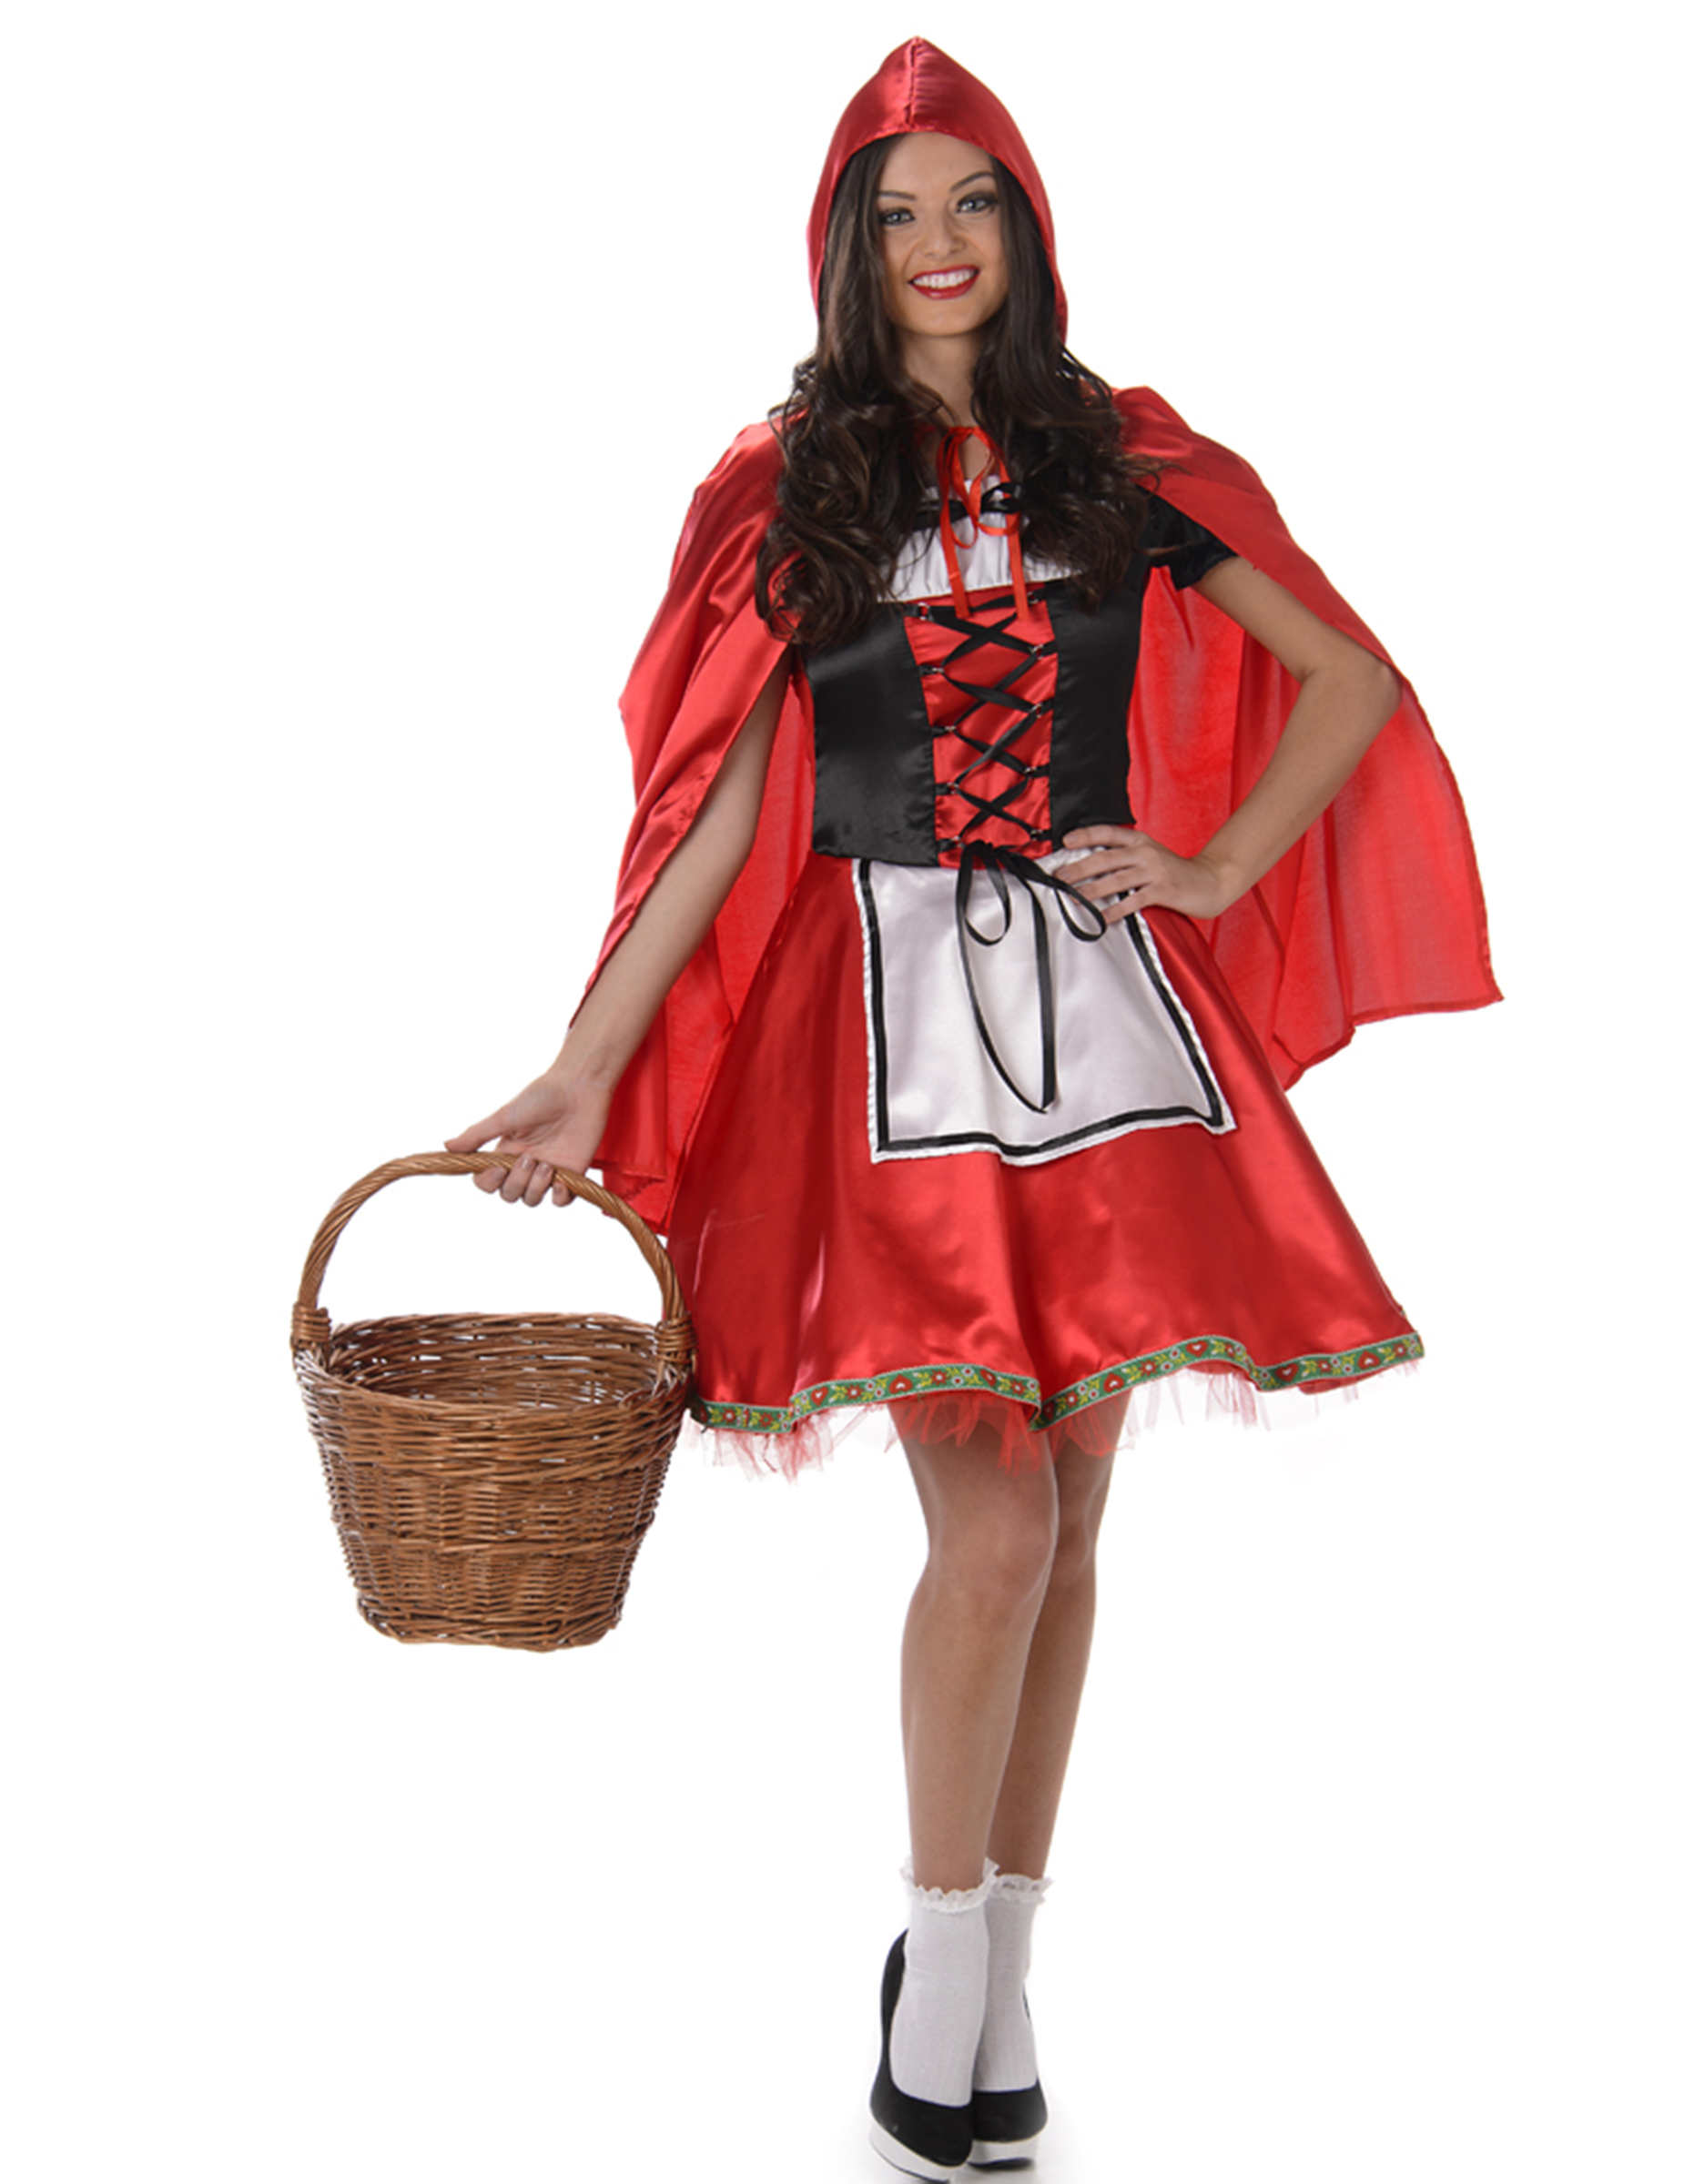 Disfraz de caperucita roja mujer disfraces adultos y - Disfraz bebe caperucita roja ...